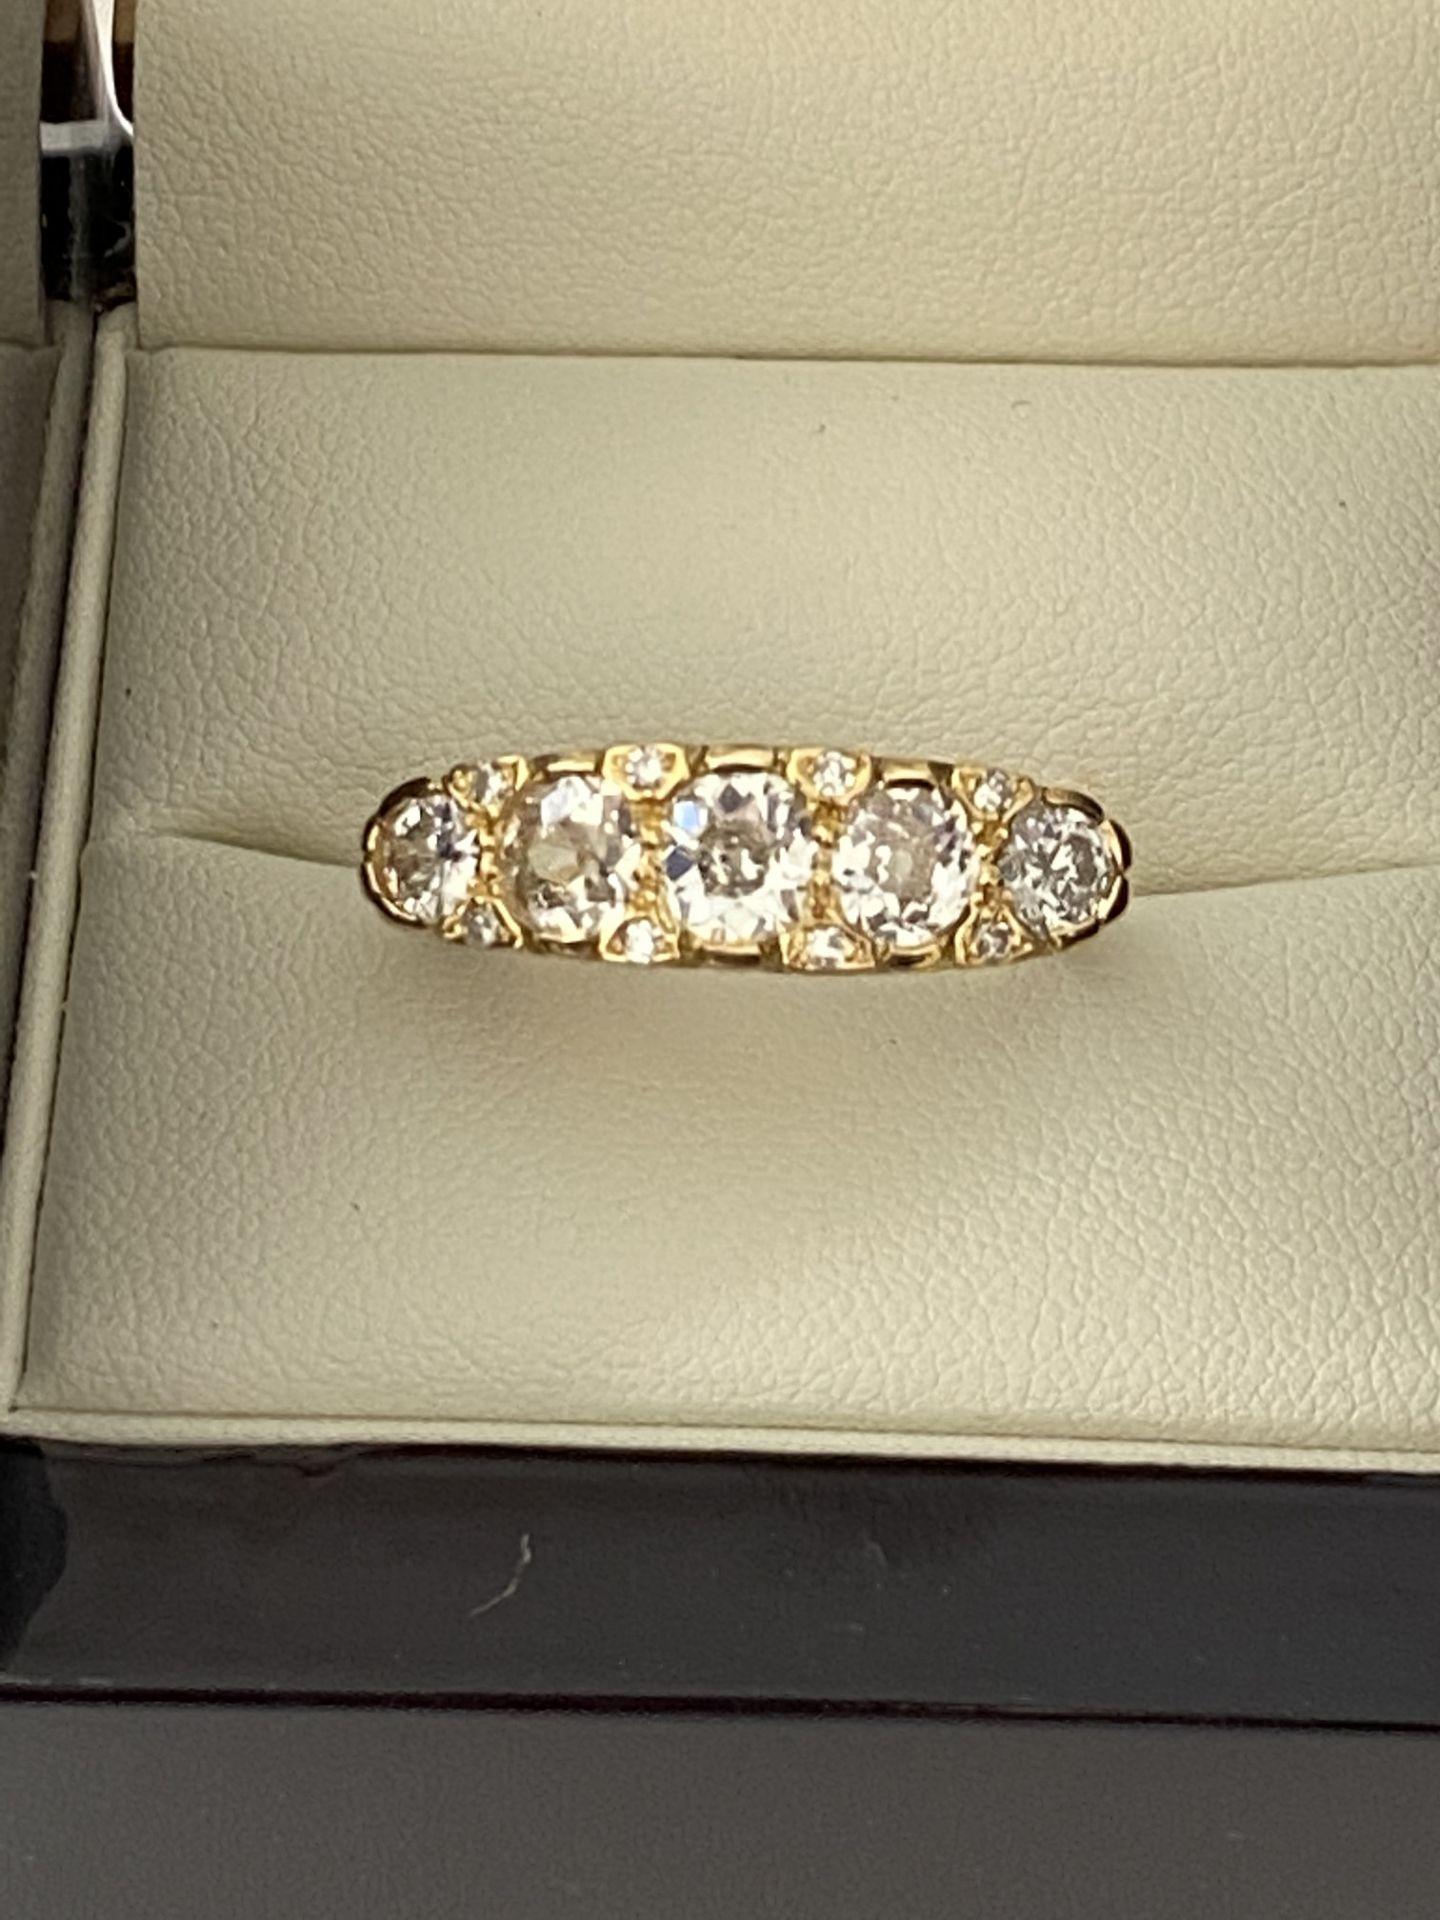 FINE 18ct YELLOW GOLD 2.00ct 5 STONE DIAMOND RING - Image 6 of 15